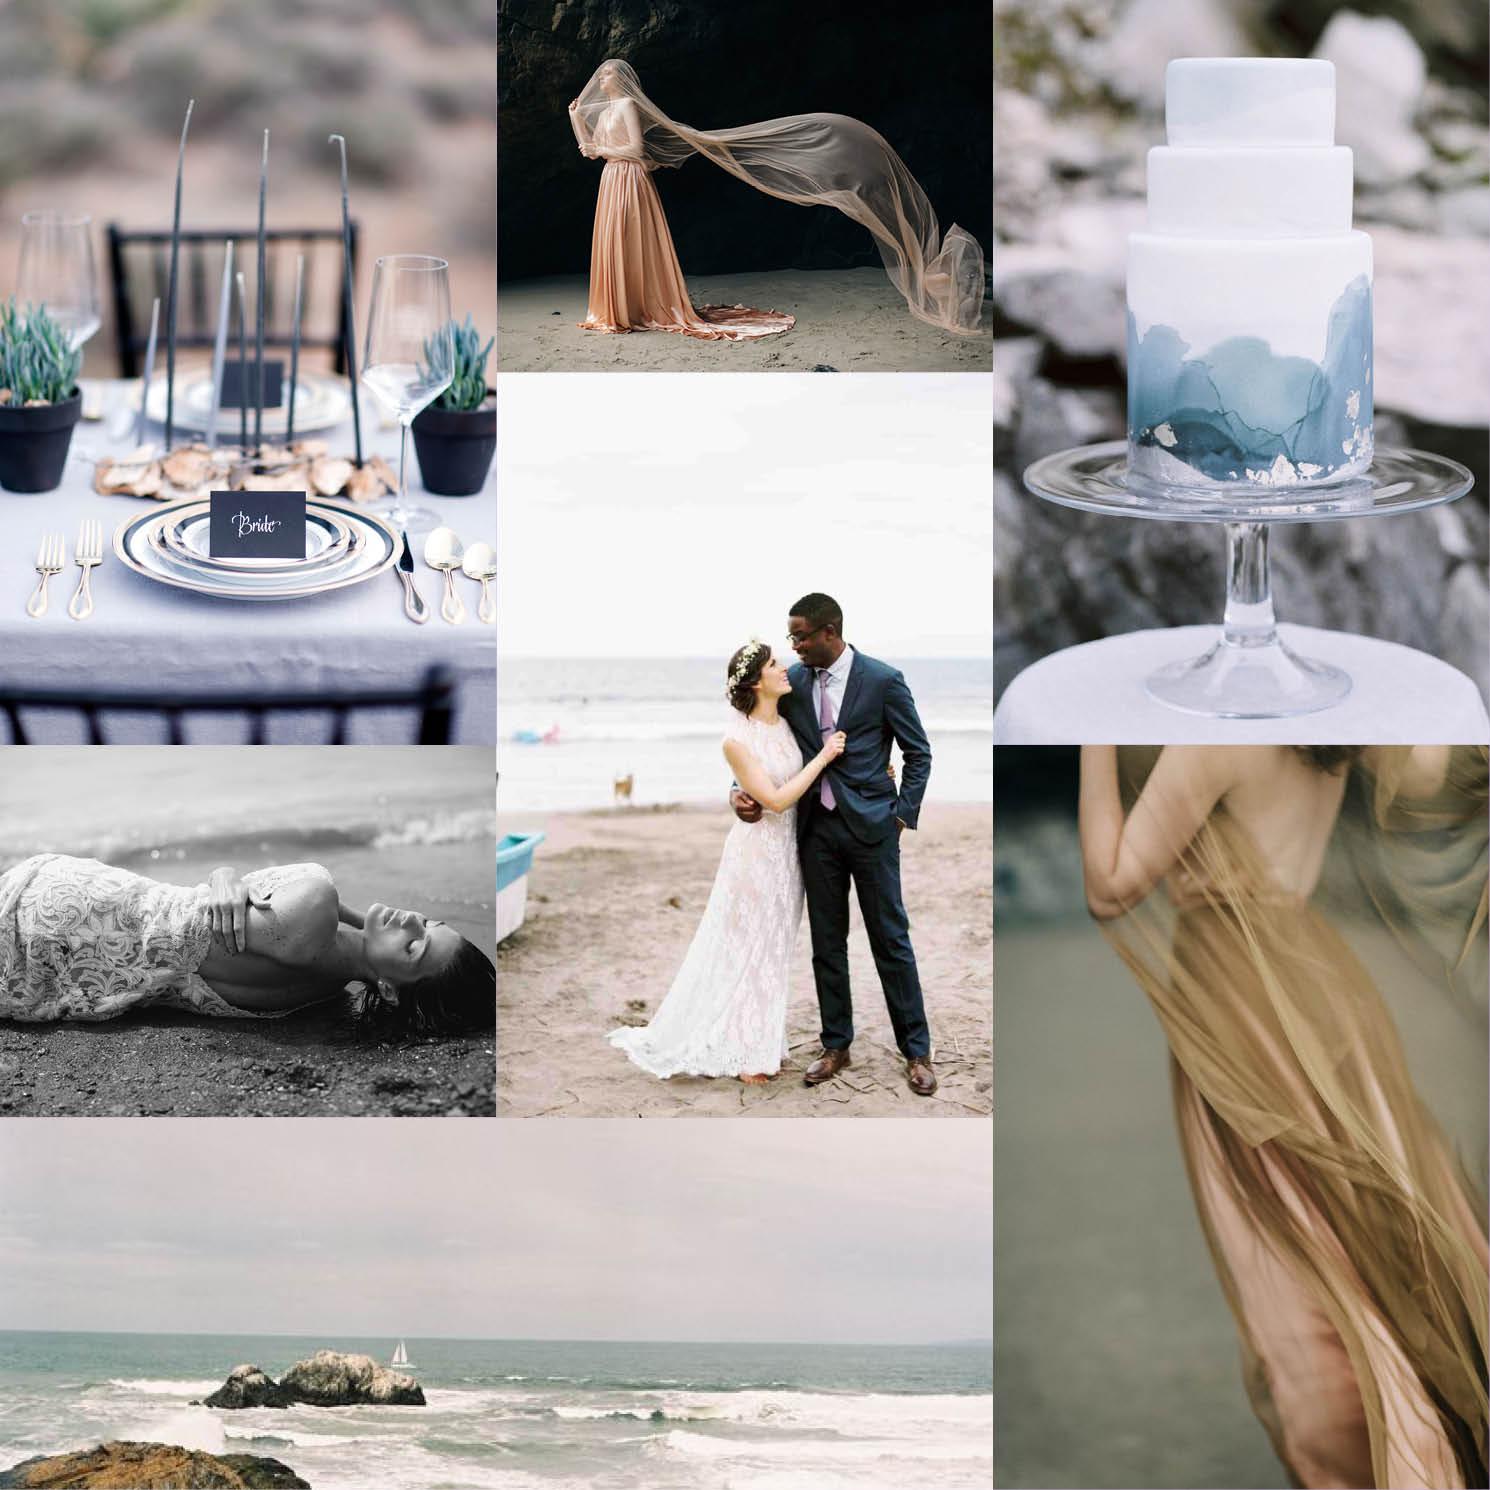 Engaged // Trouwbeurs + Trouwblog